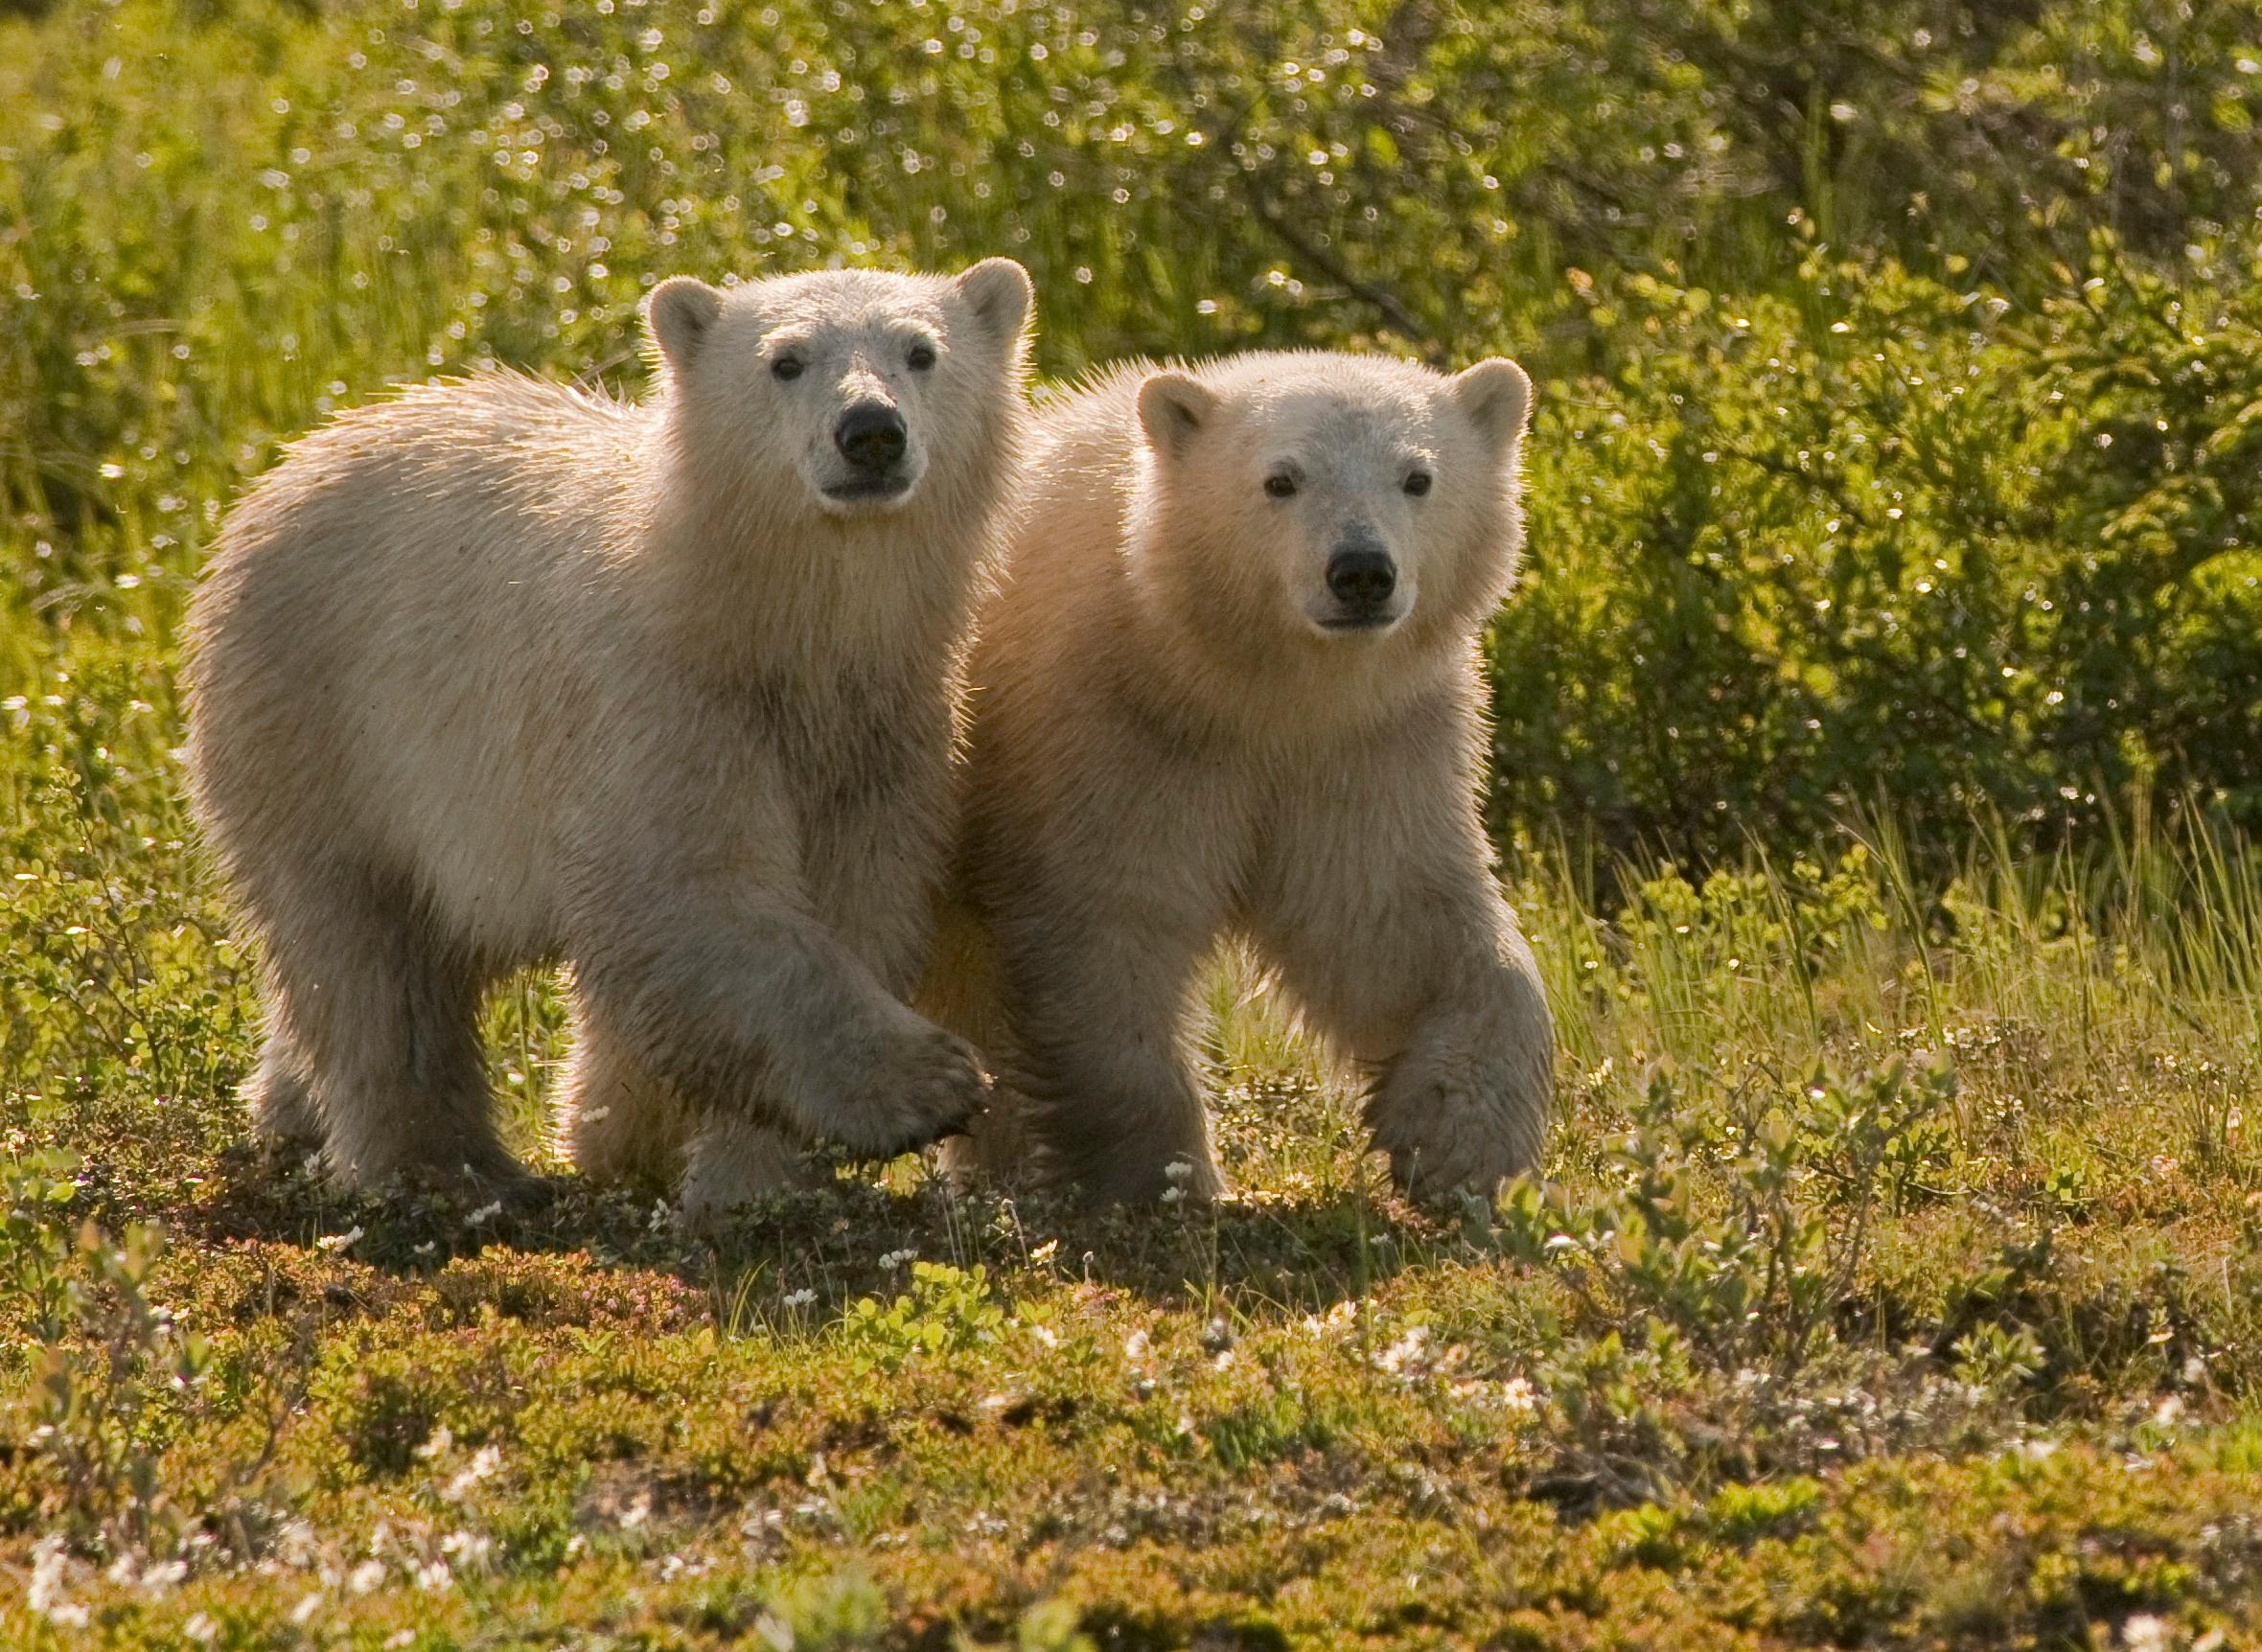 jxvo4s7xRT2XXX1LoiXg_full_polar bear cubs shadows +4 copy.jpg